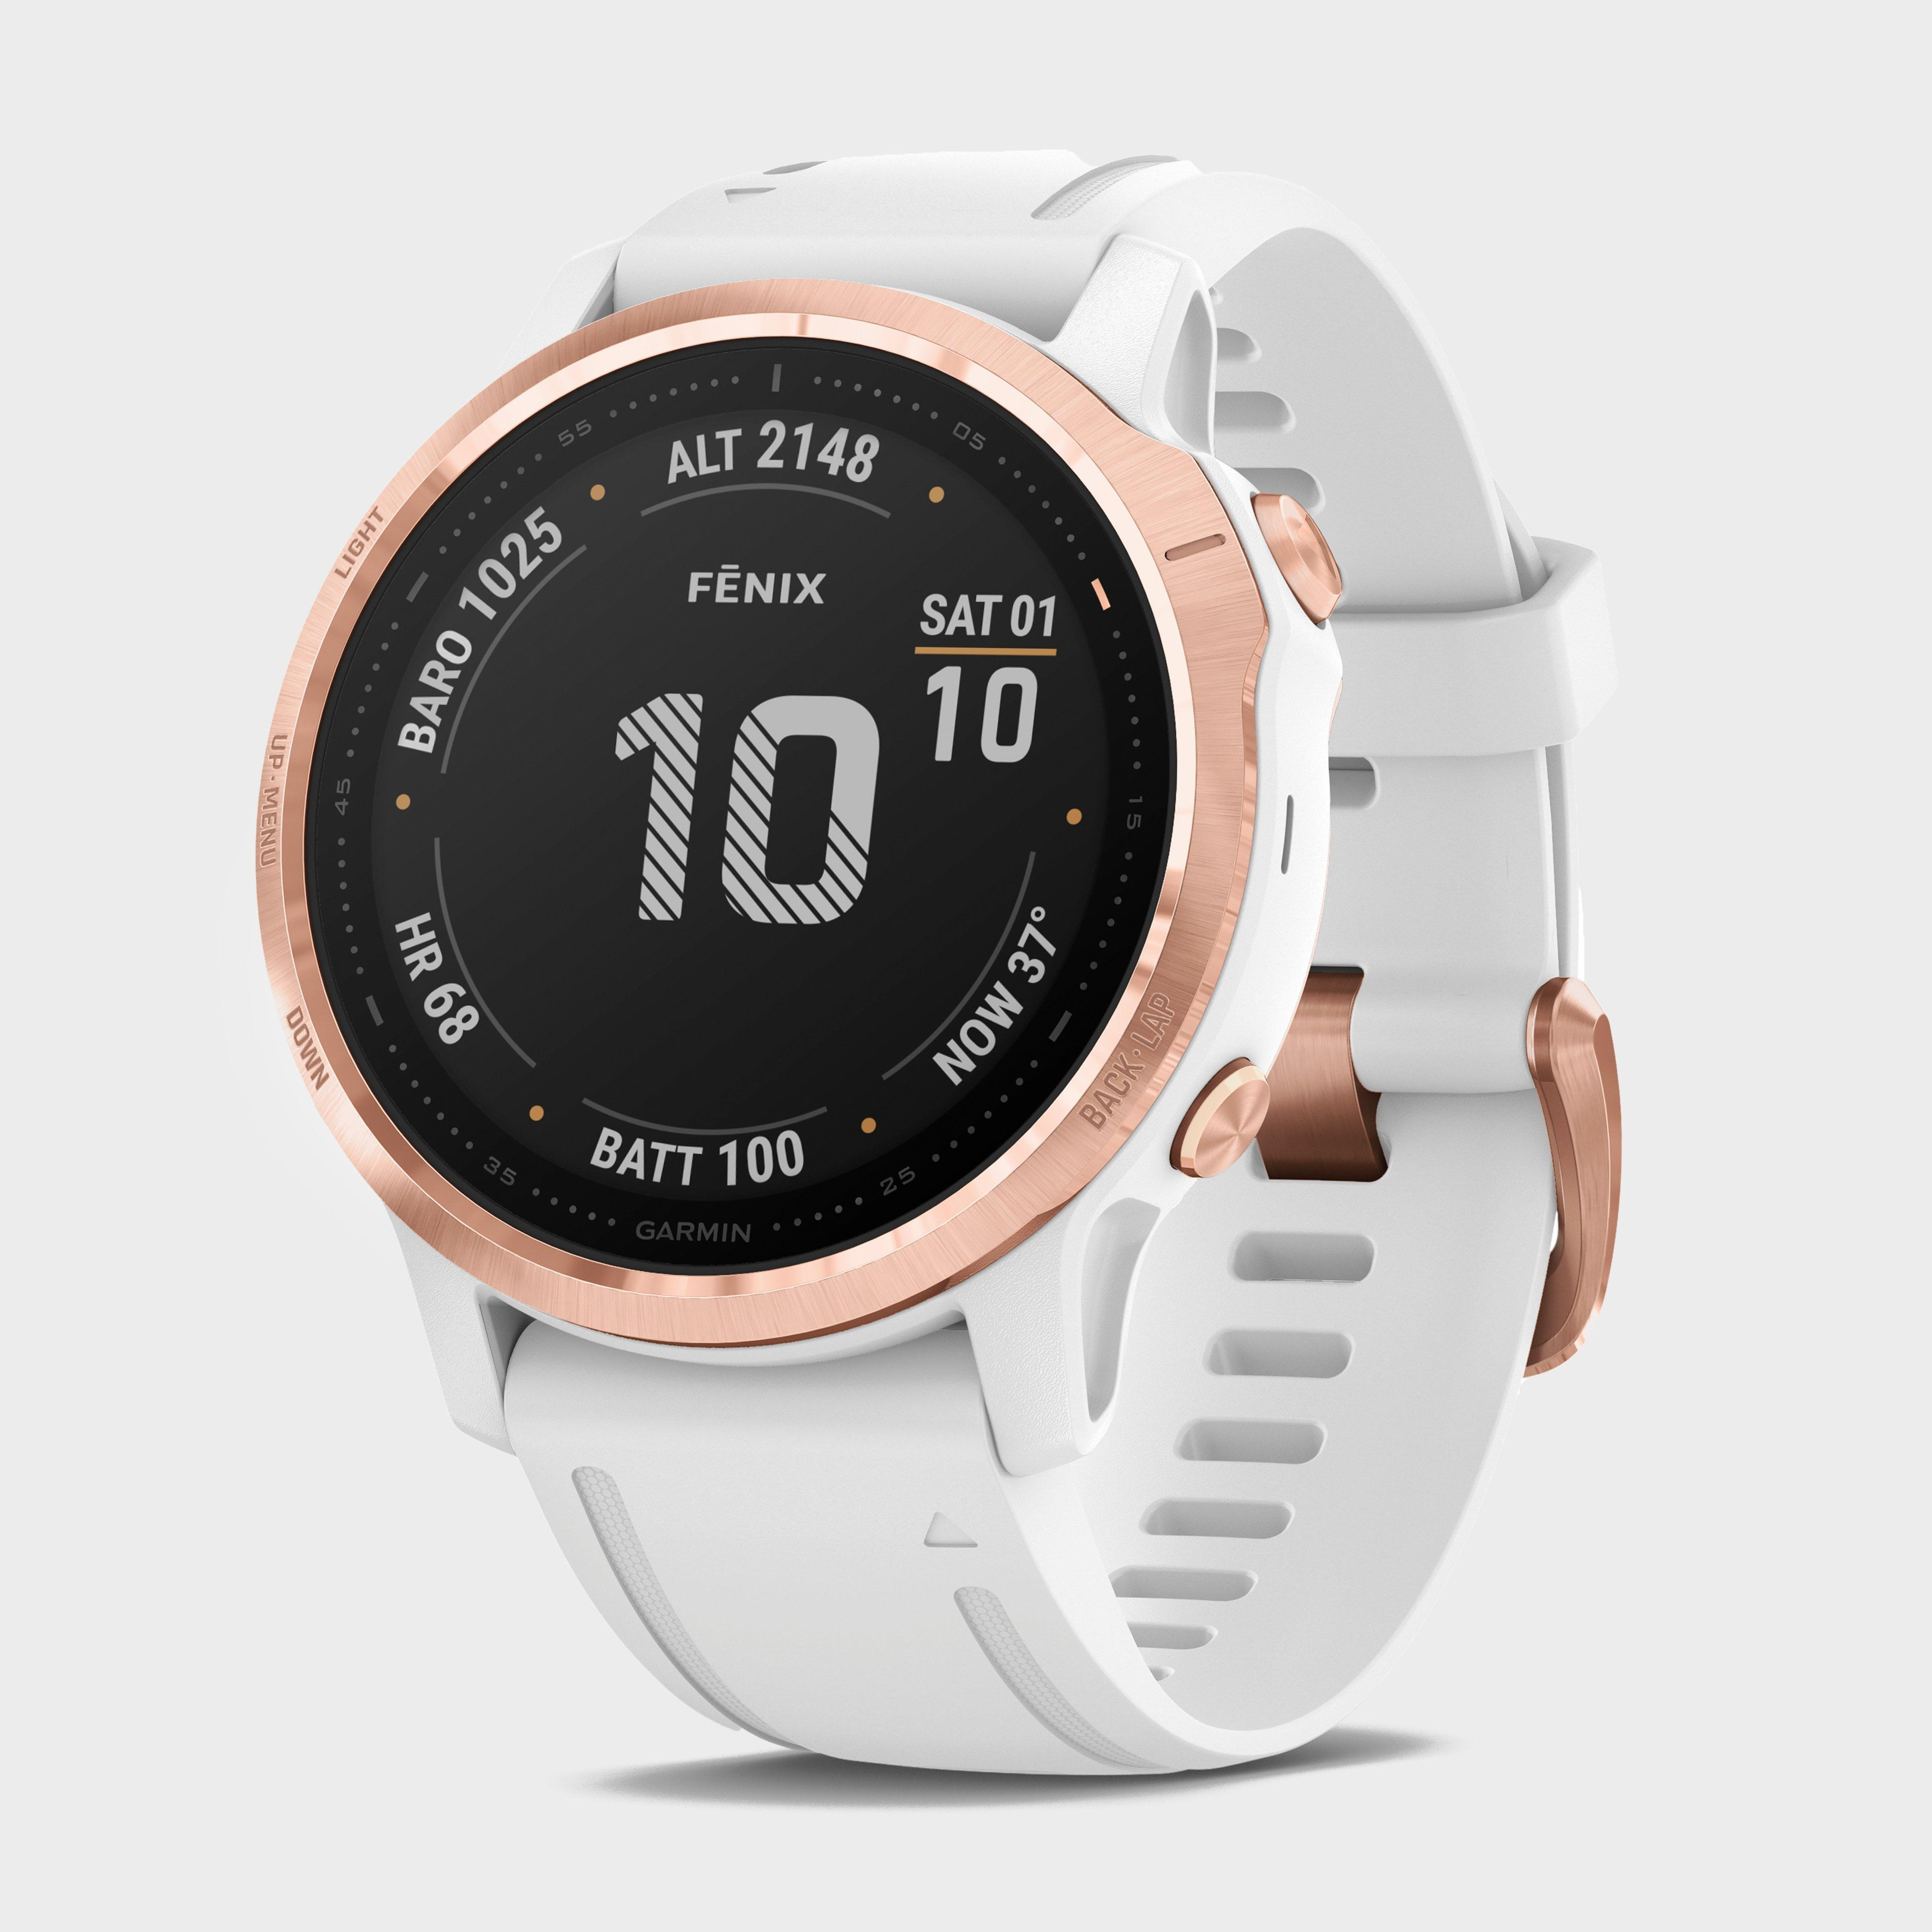 Garmin Fēnix 6S Pro Multi-Sport Gps Watch - White/Wht, White/WHT